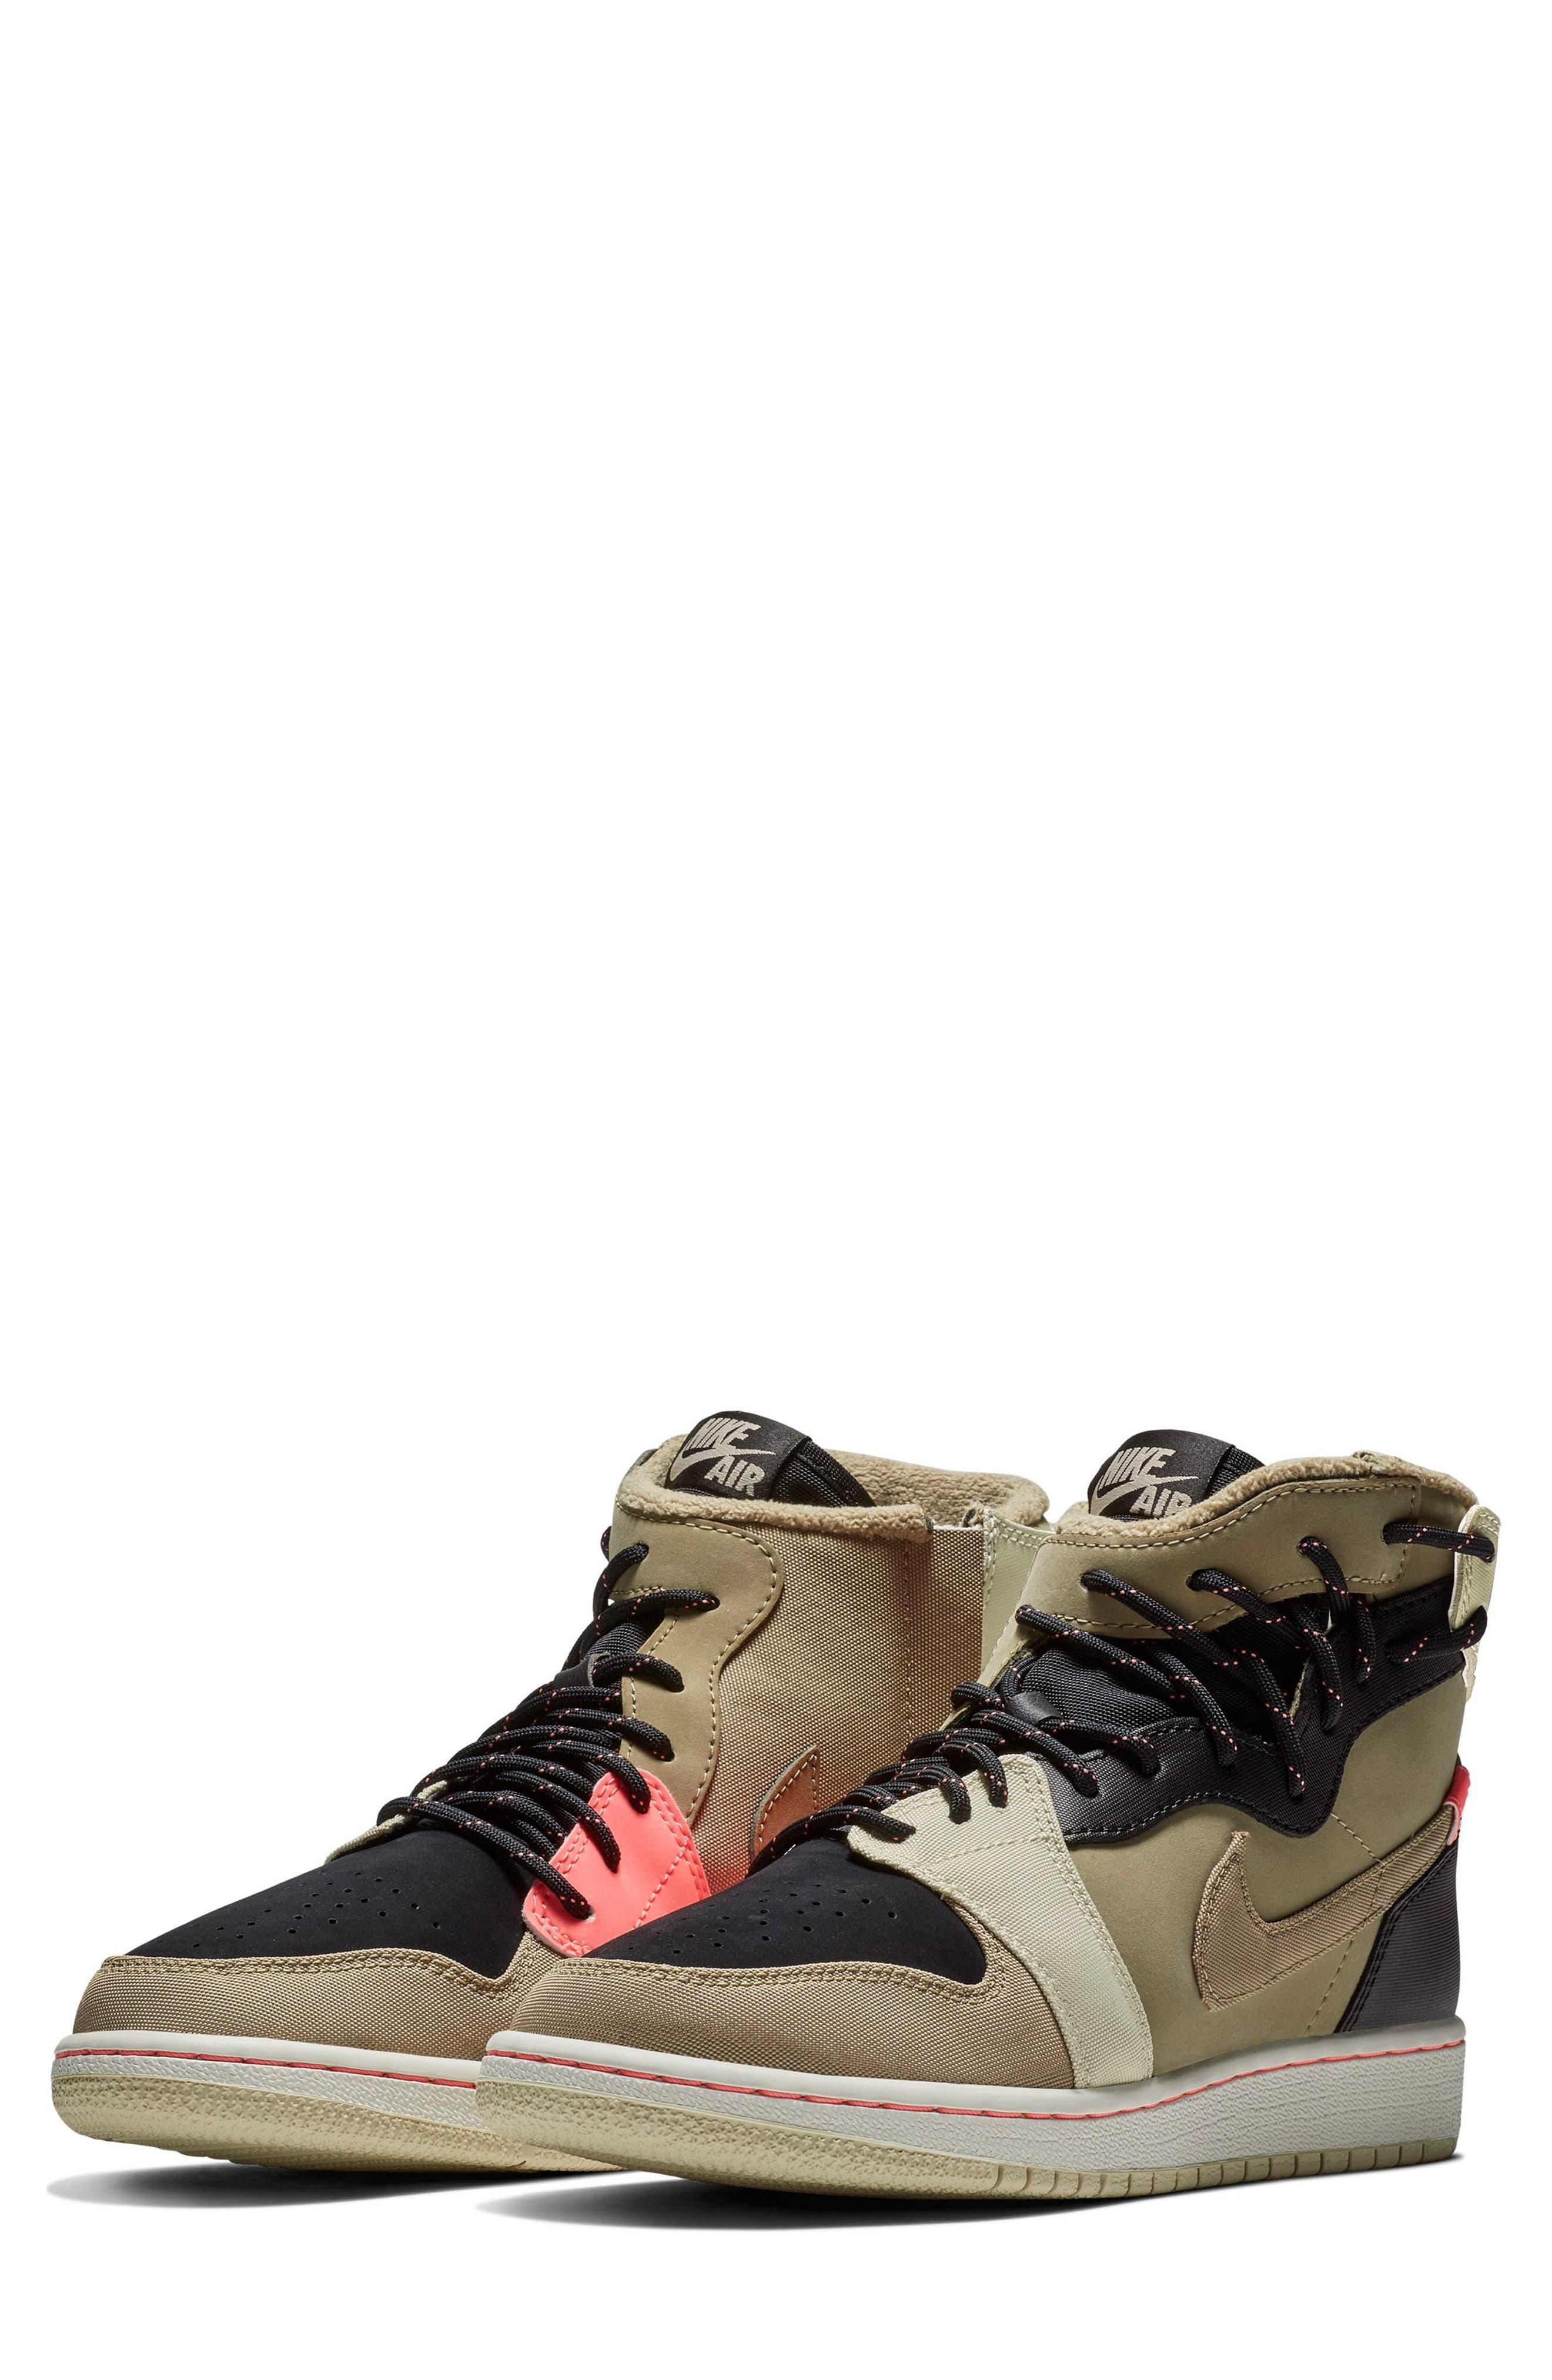 Air Jordan 1 Rebel XX Utility High Top Sneaker, Main, color, PARACHUTE BEIGE